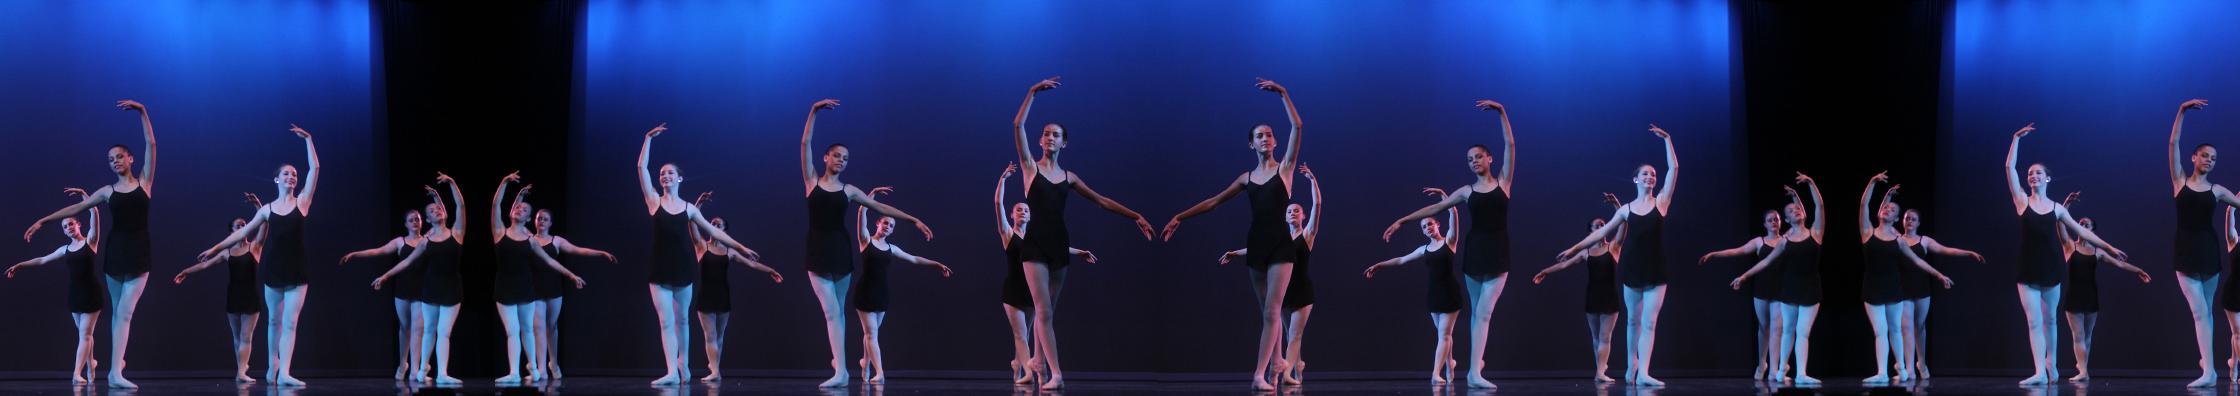 State street Arlington Theatre Nutcracker Santa Barbara Festival Ballet Tradition14